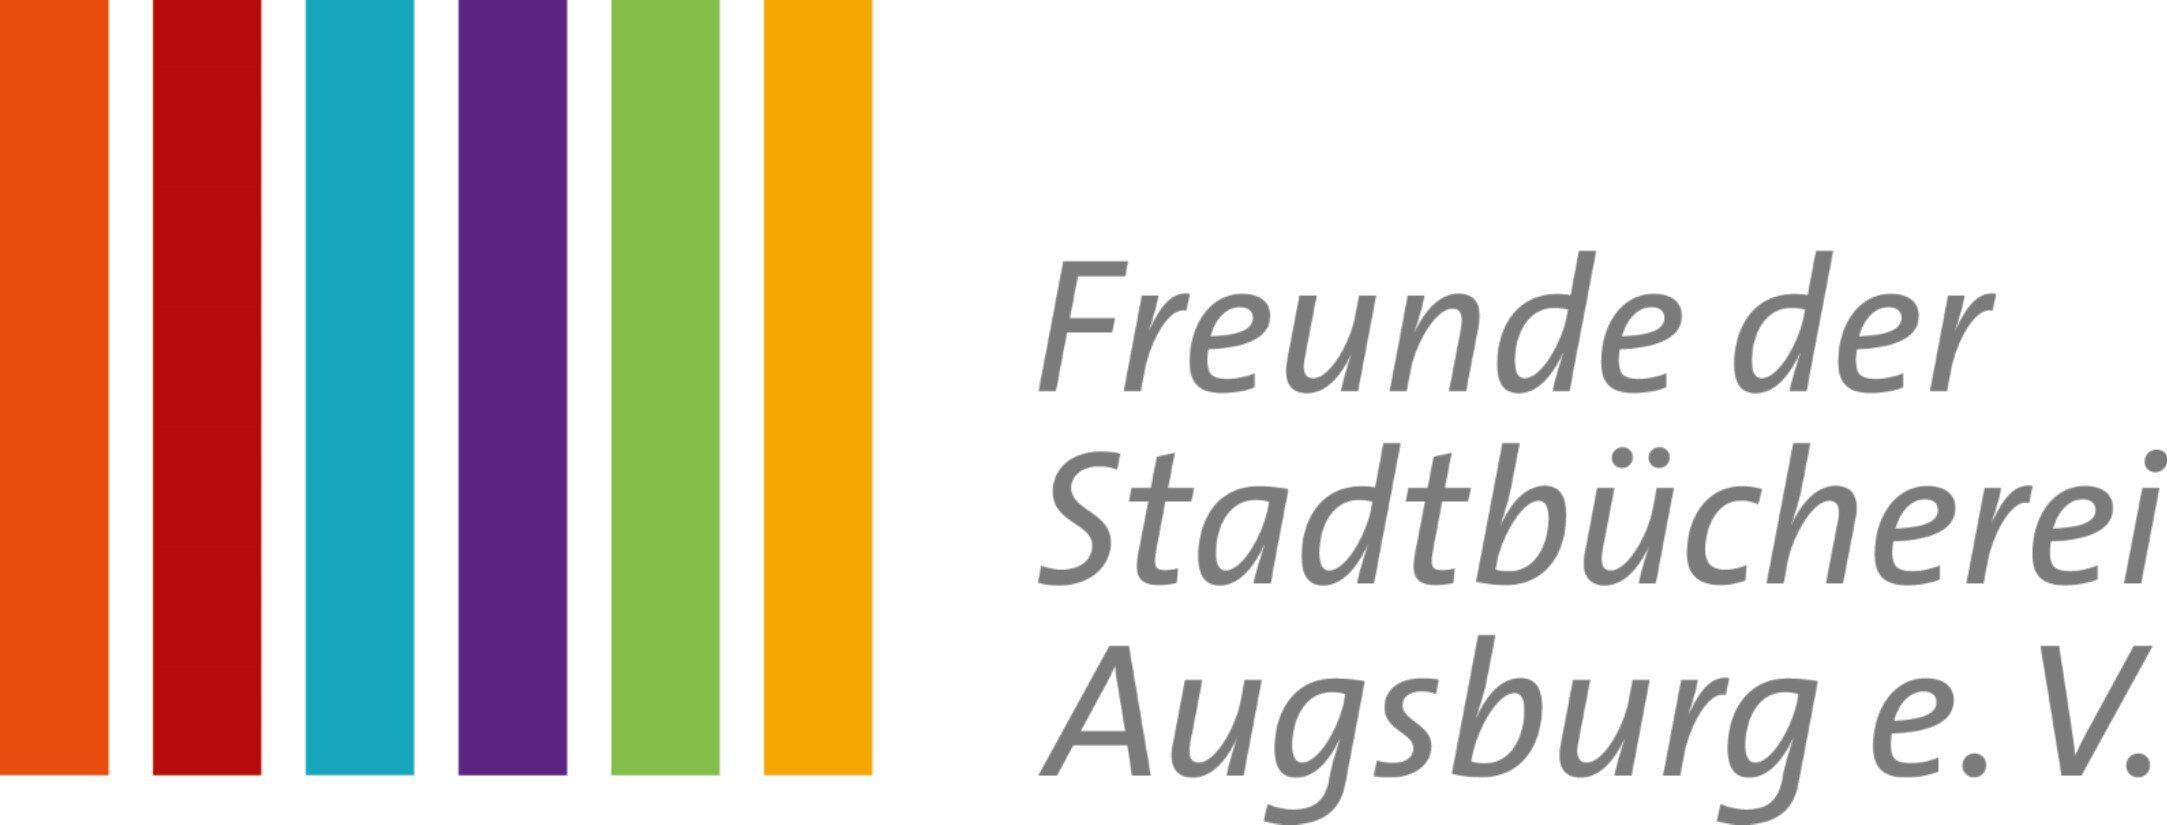 Freunde der Stadtbücherei Augsburg e.V.